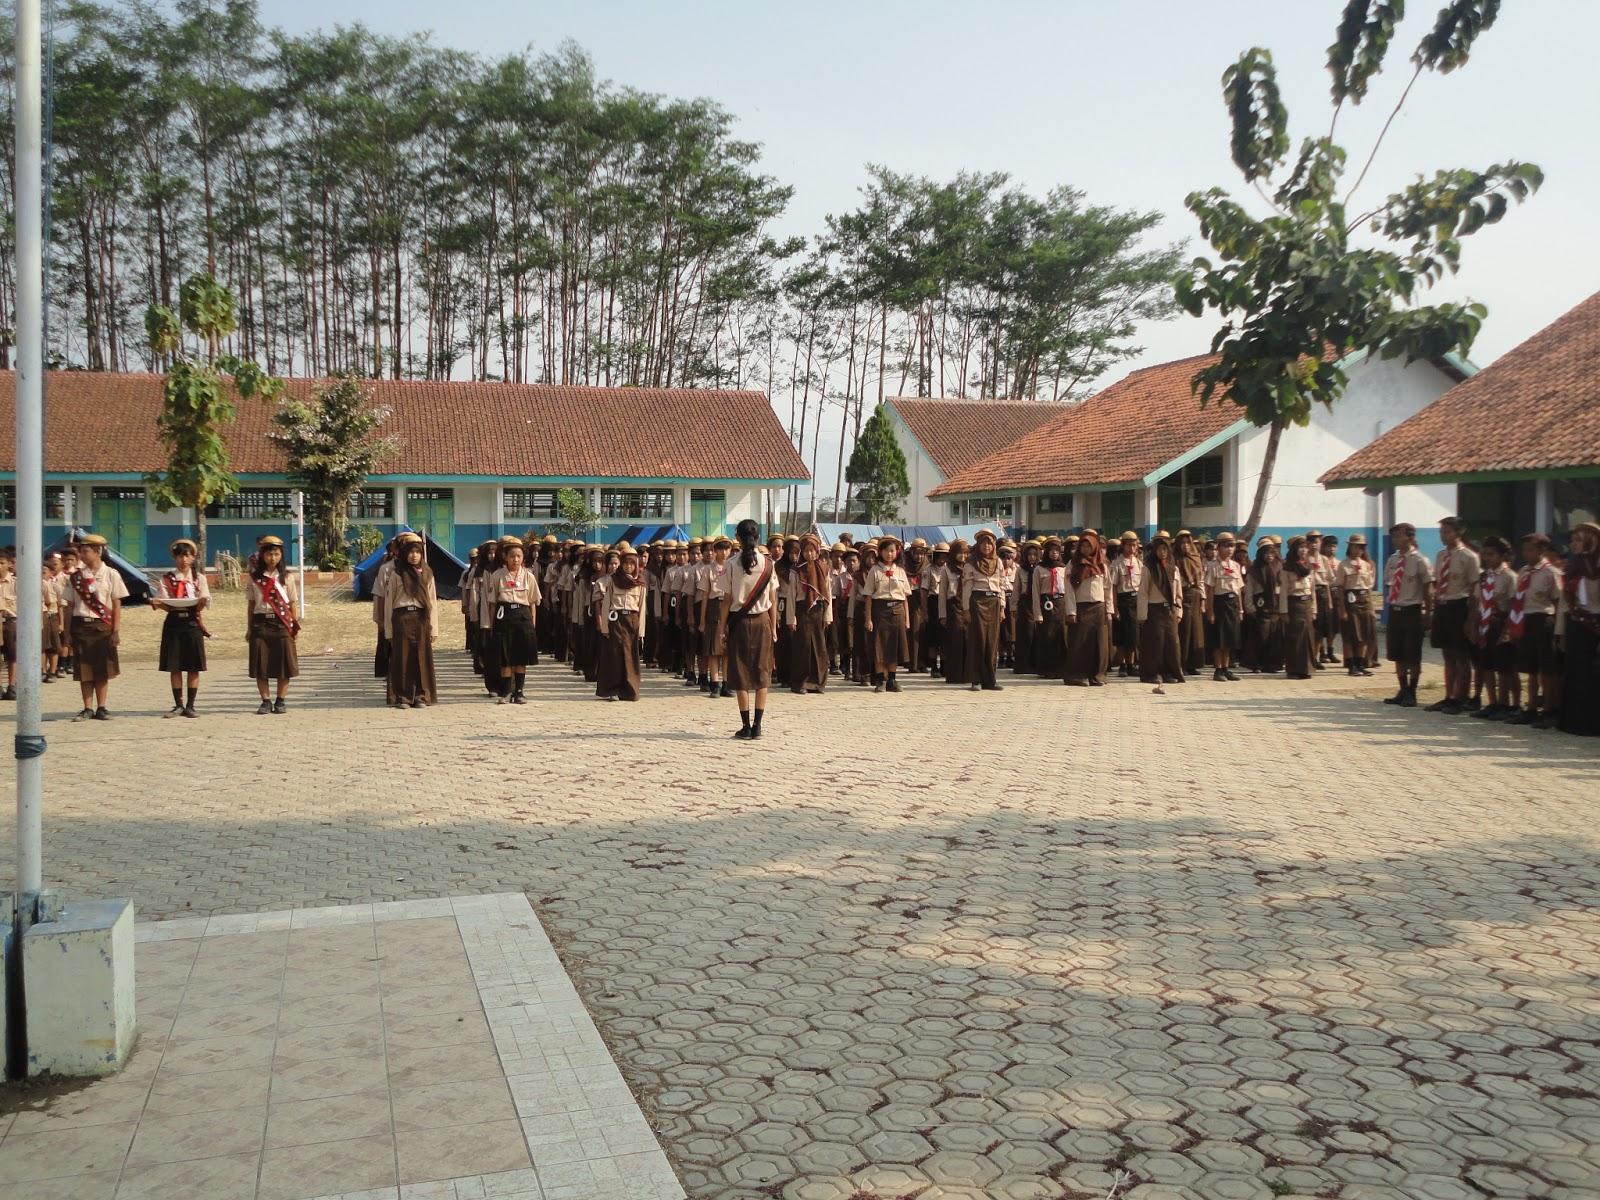 Pramuka Smp N 2 Randudongkal Pasgama Upacara Penggalang Aneka Badge Regu 1 Pemeriksaan Kebersihan Dan Kerapian Setiap Anggota Oleh Komandan